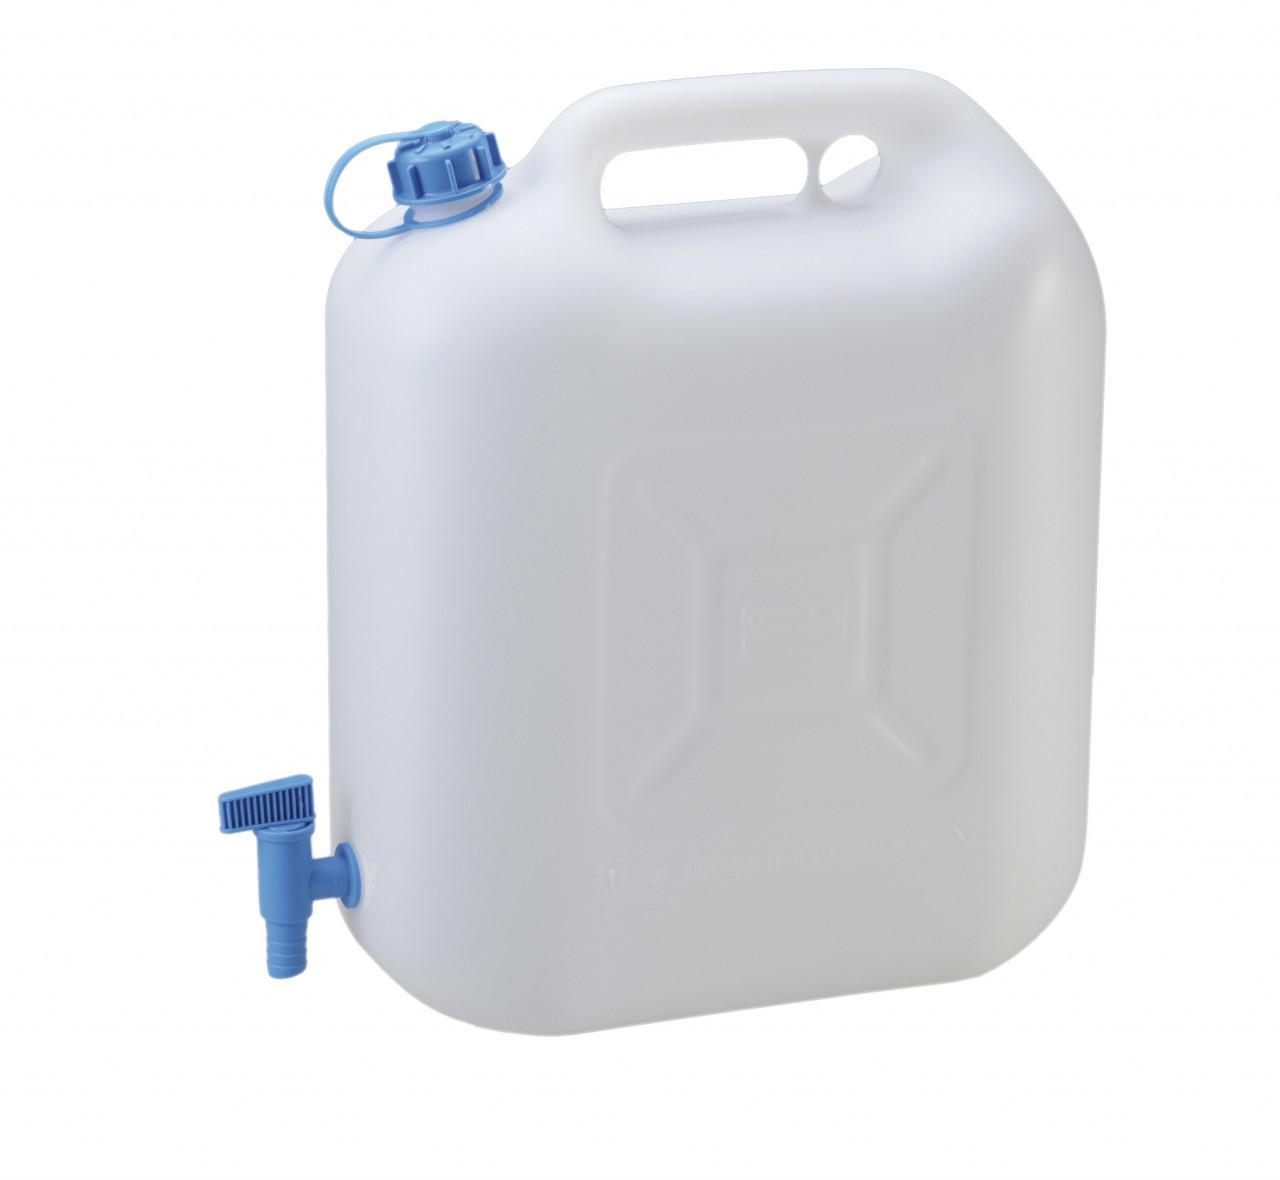 Hünersdorff Wasserkanister Eco 22 Liter   4007228817676